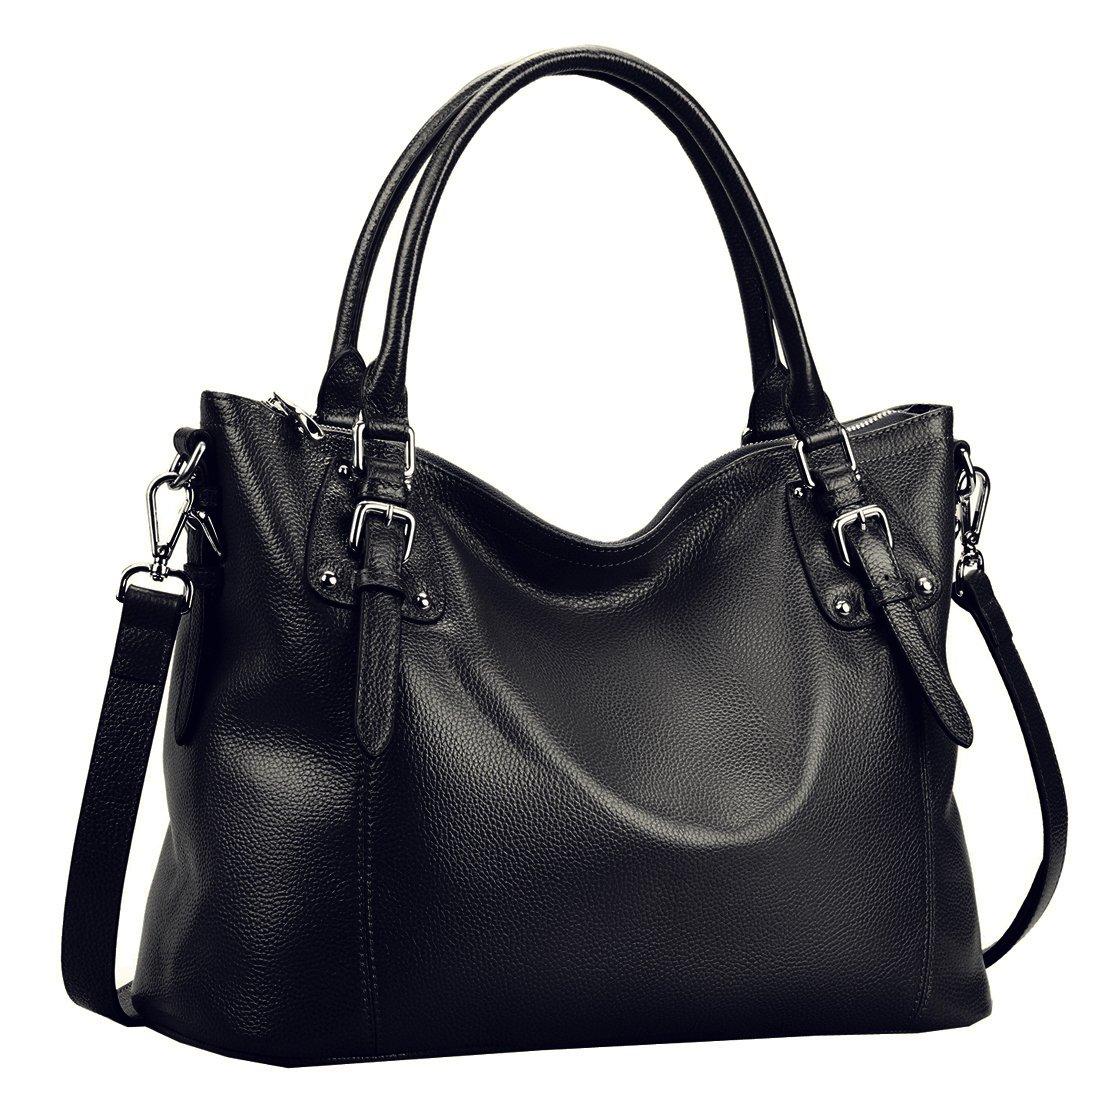 Heshe Womens Genuinne Leather Handbags Tote Top Handle Bag Shoulder Bag for  Women Crossbody Bags Ladies 4d267c3630e